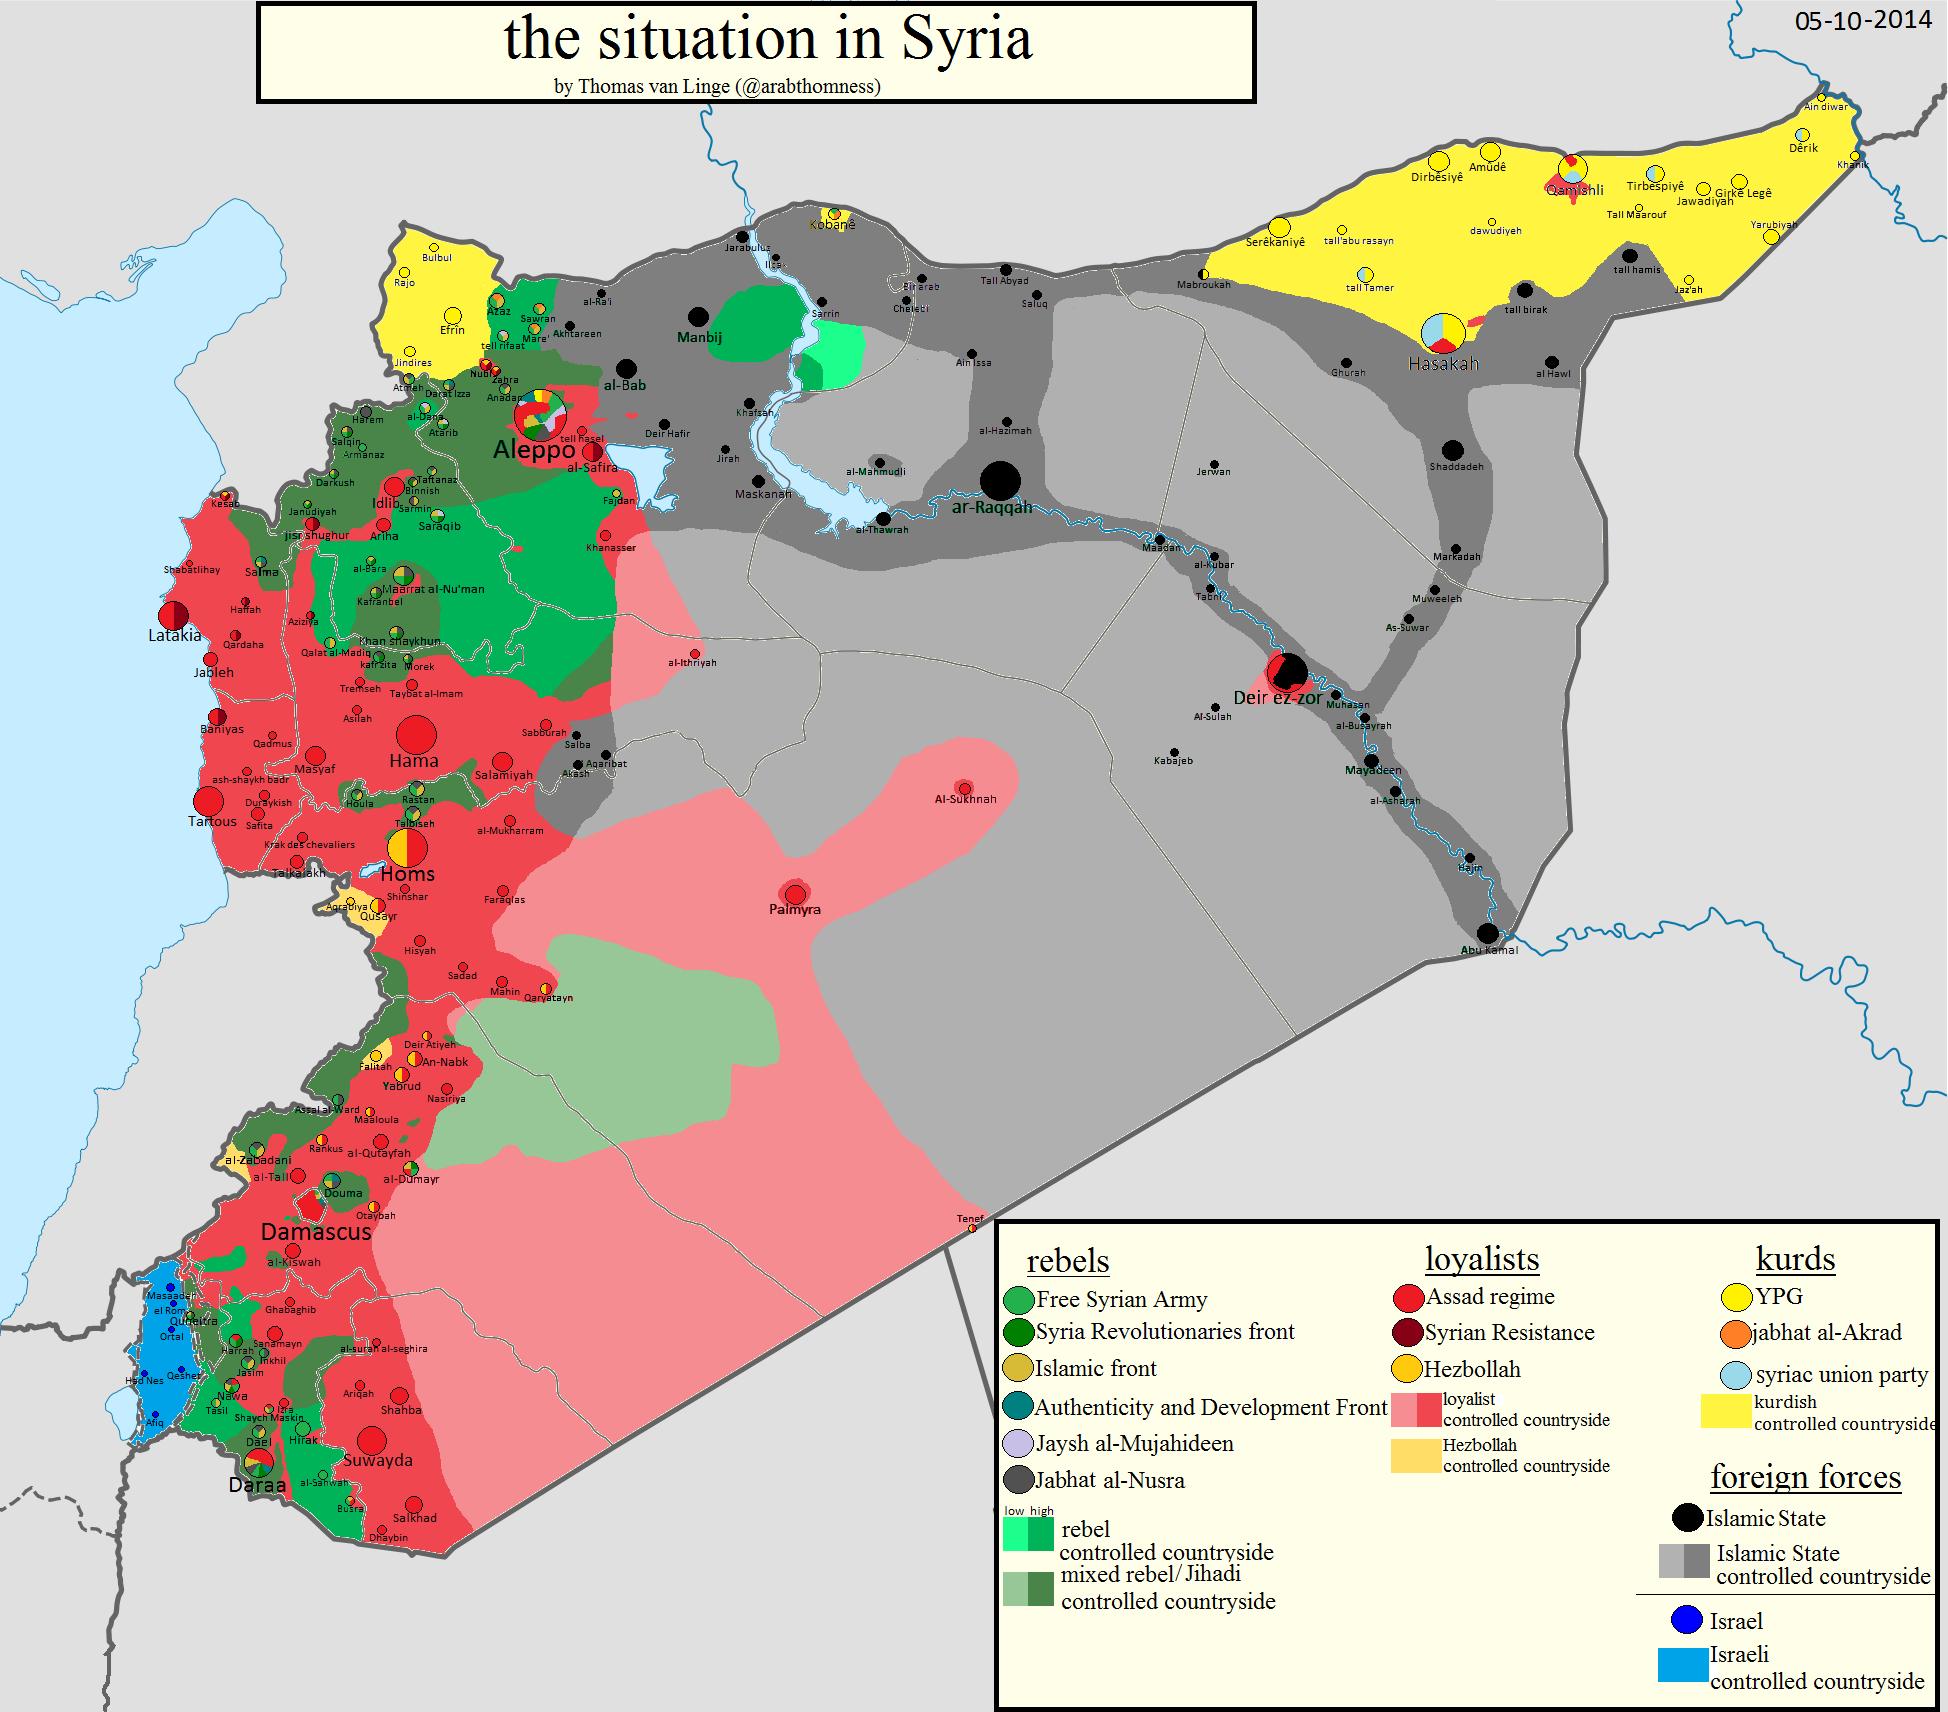 http://www.les-crises.fr/wp-content/uploads/2015/10/24-syrie-10-2014.png